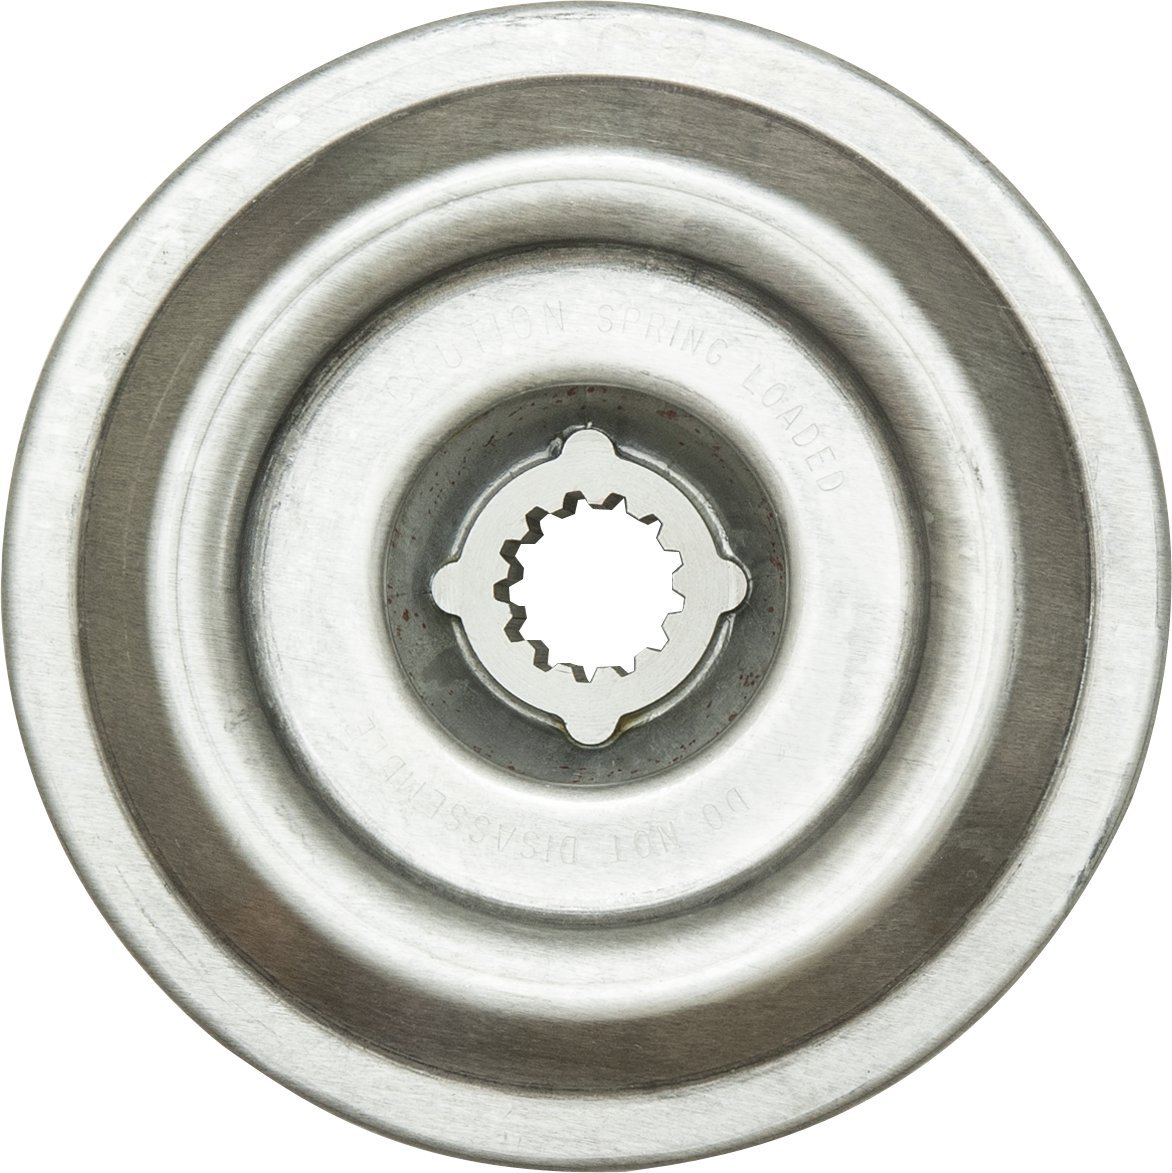 Whirlpool 6-2011900 Brake Assembly